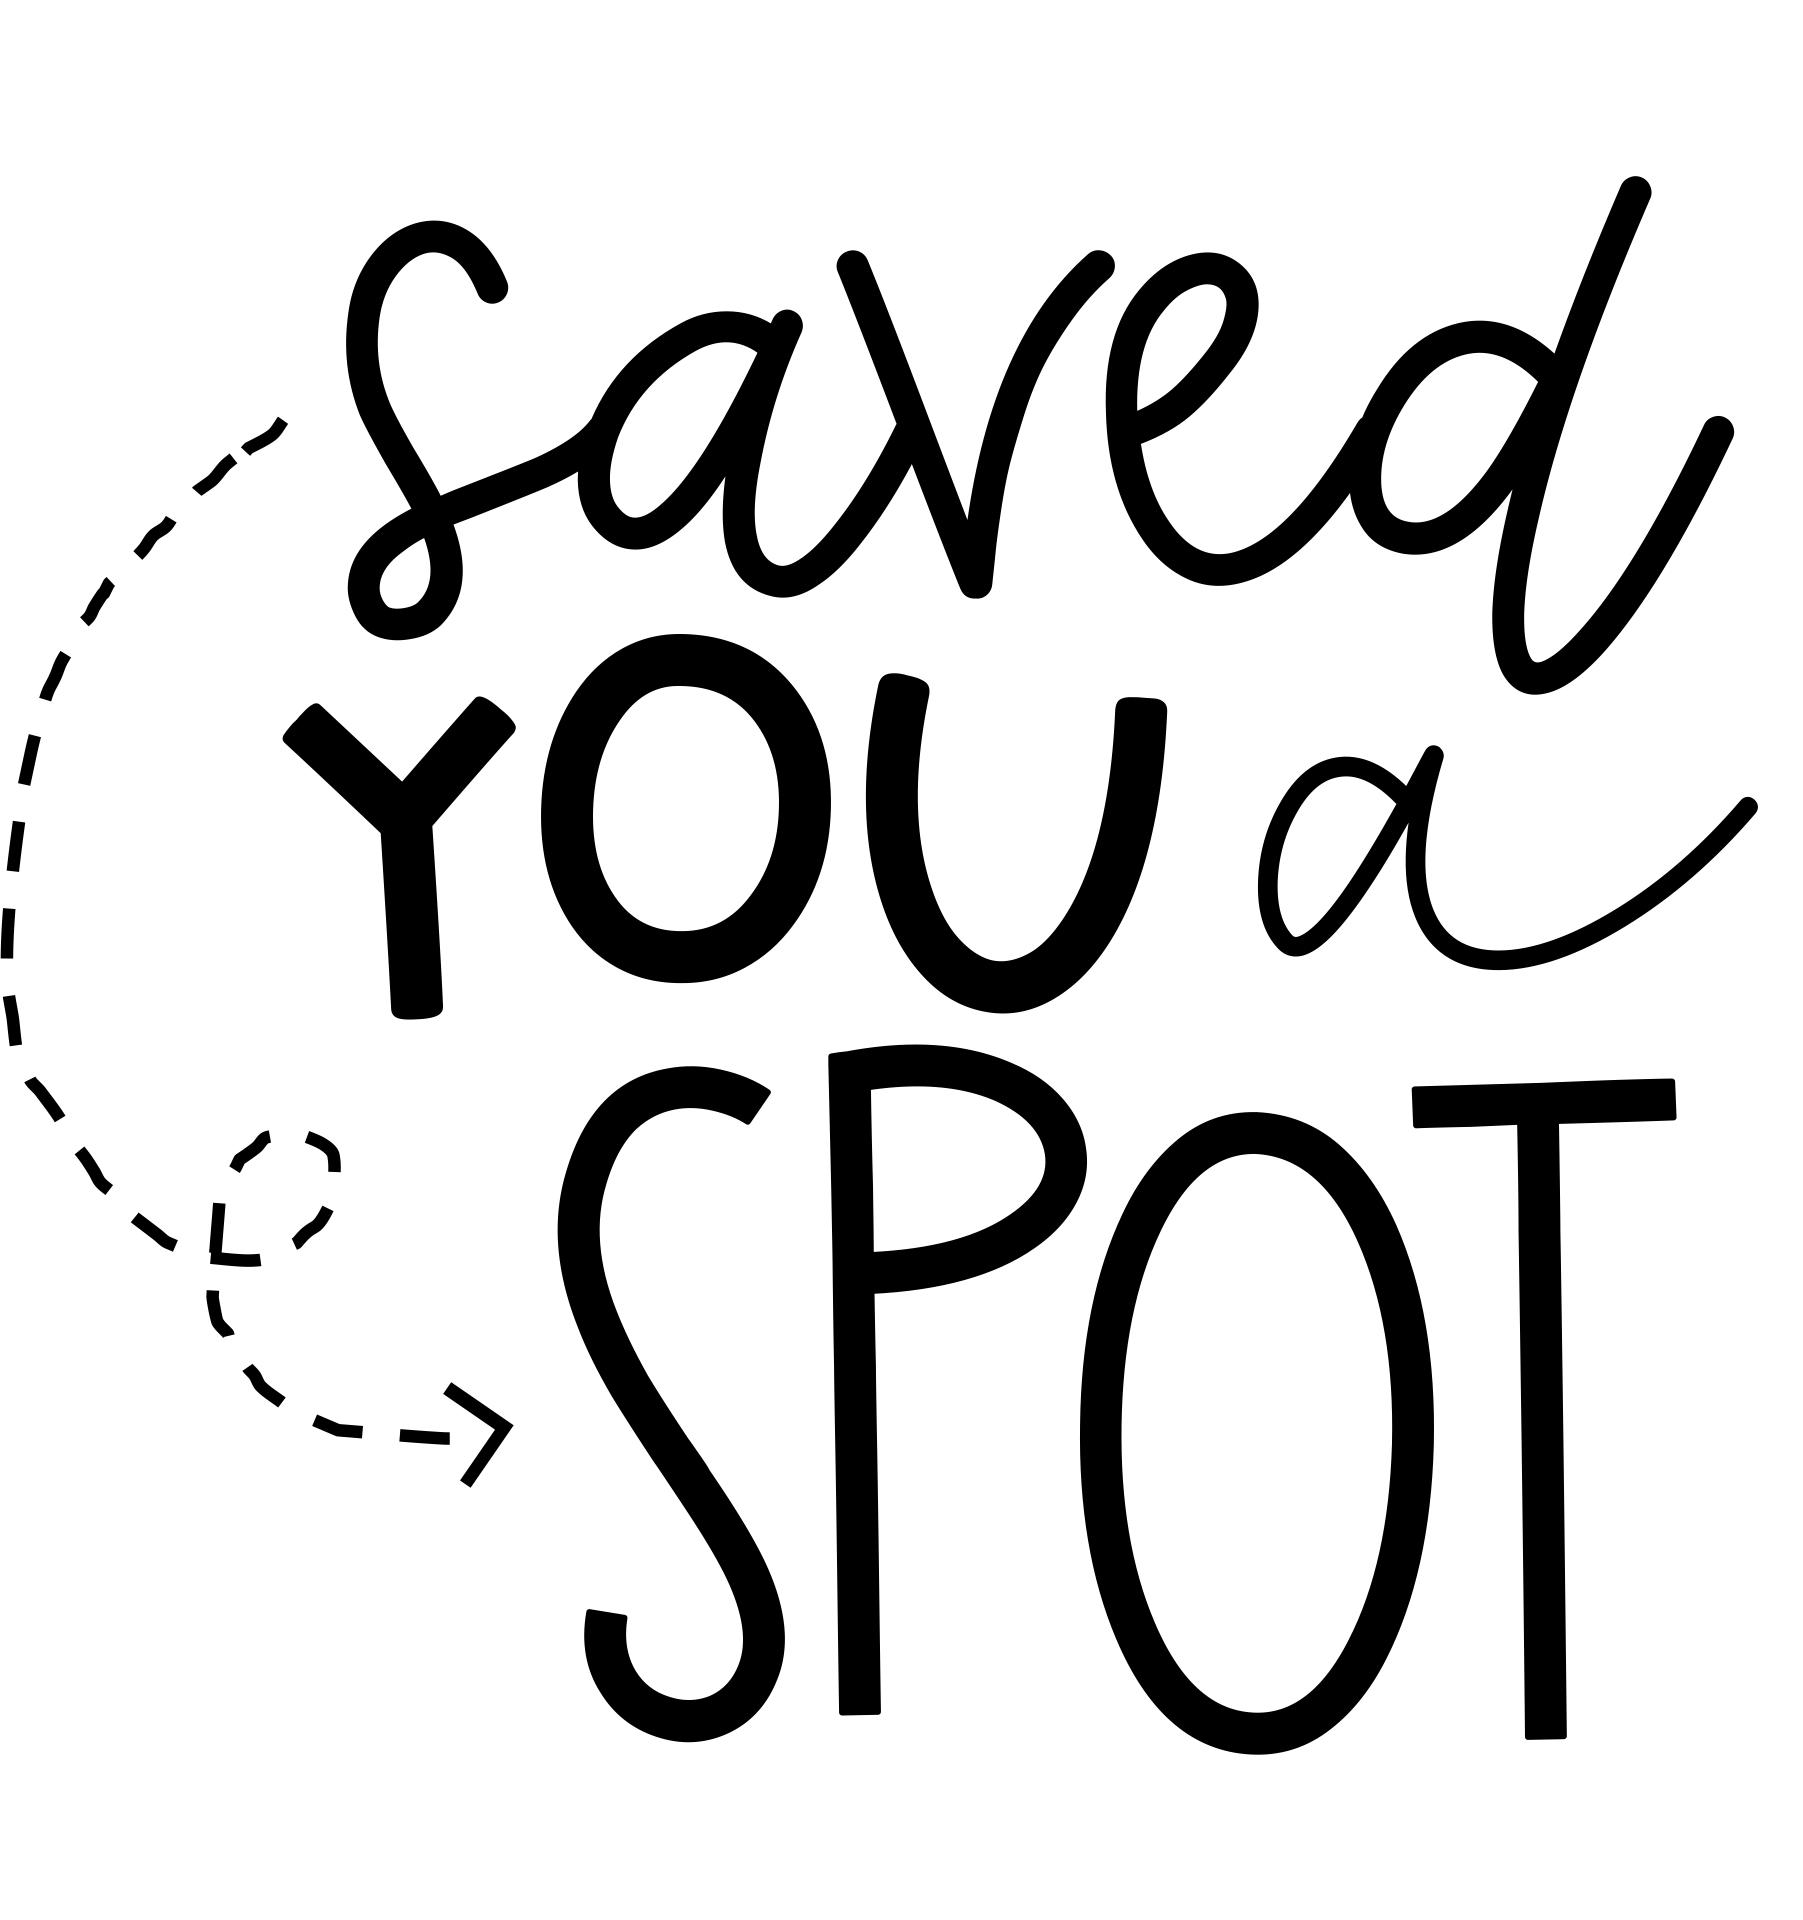 Saved You a Spot